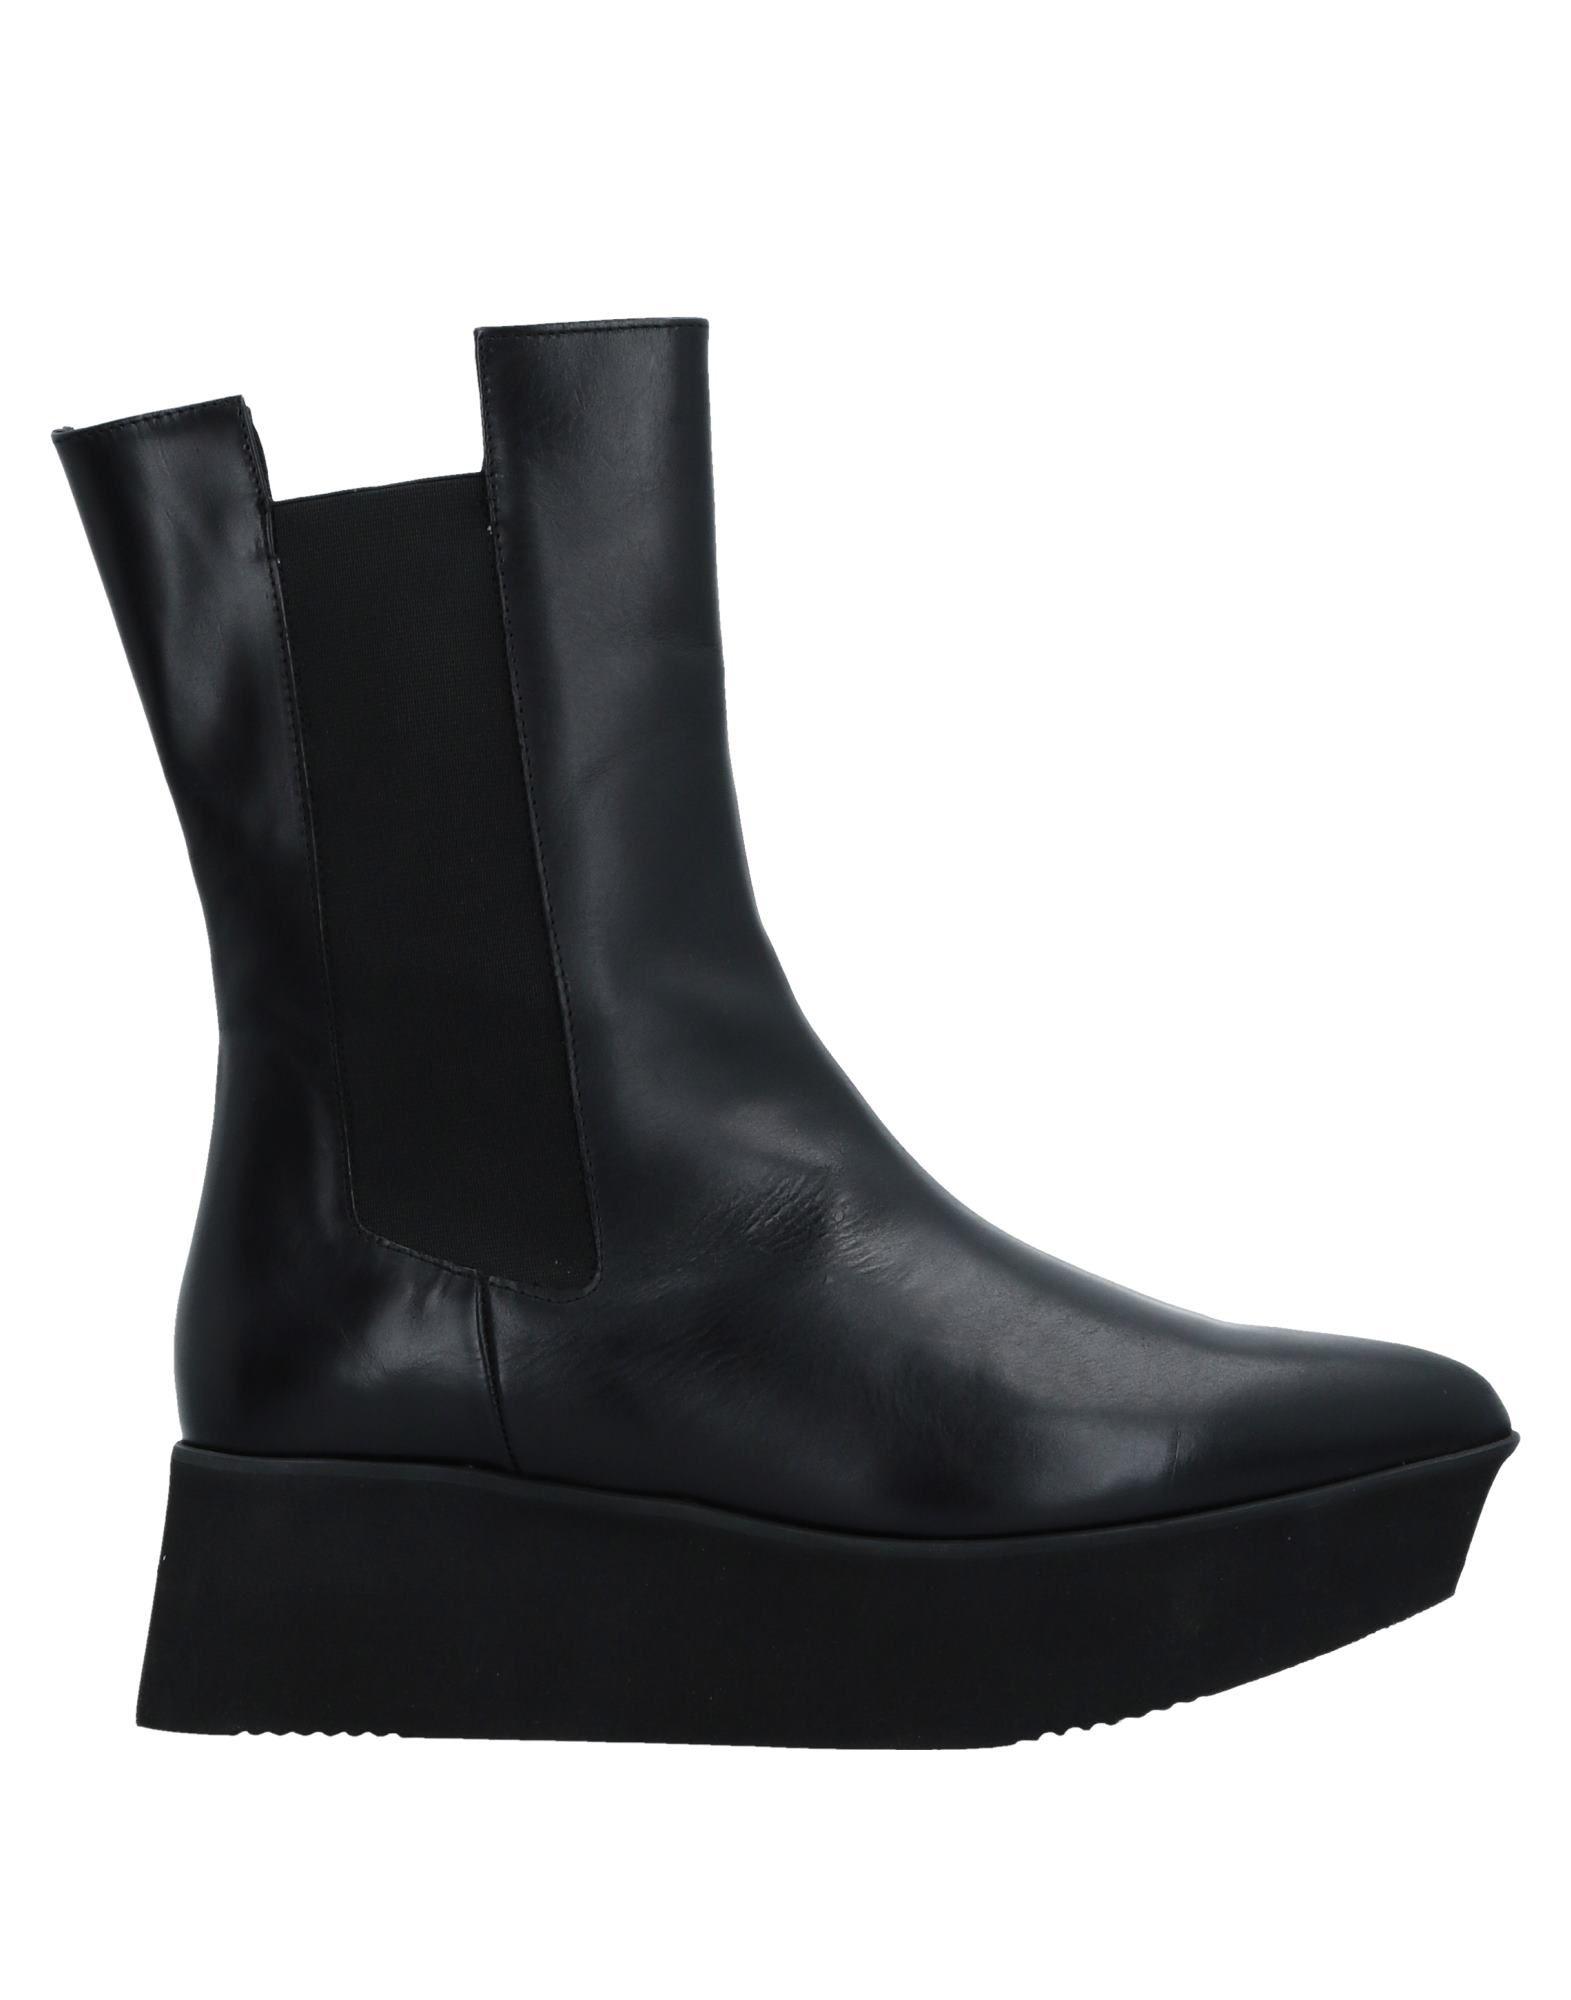 Stilvolle billige Schuhe Palomitas By Paloma Barceló Stiefelette Stiefelette Stiefelette Damen  11524834TT 7c3eb1